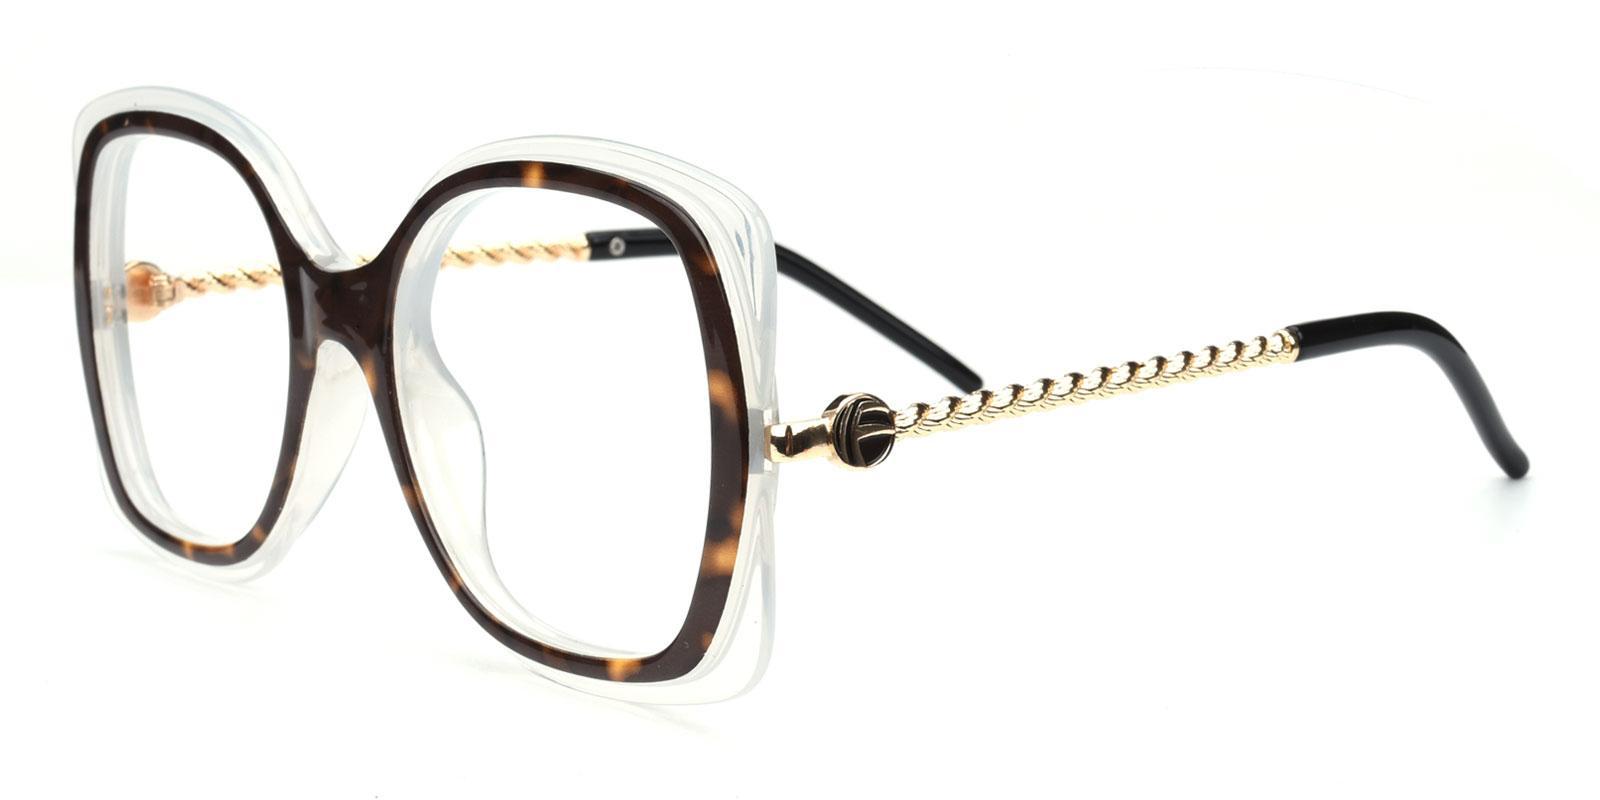 Belinda-Tortoise-Square-Plastic-Eyeglasses-additional1